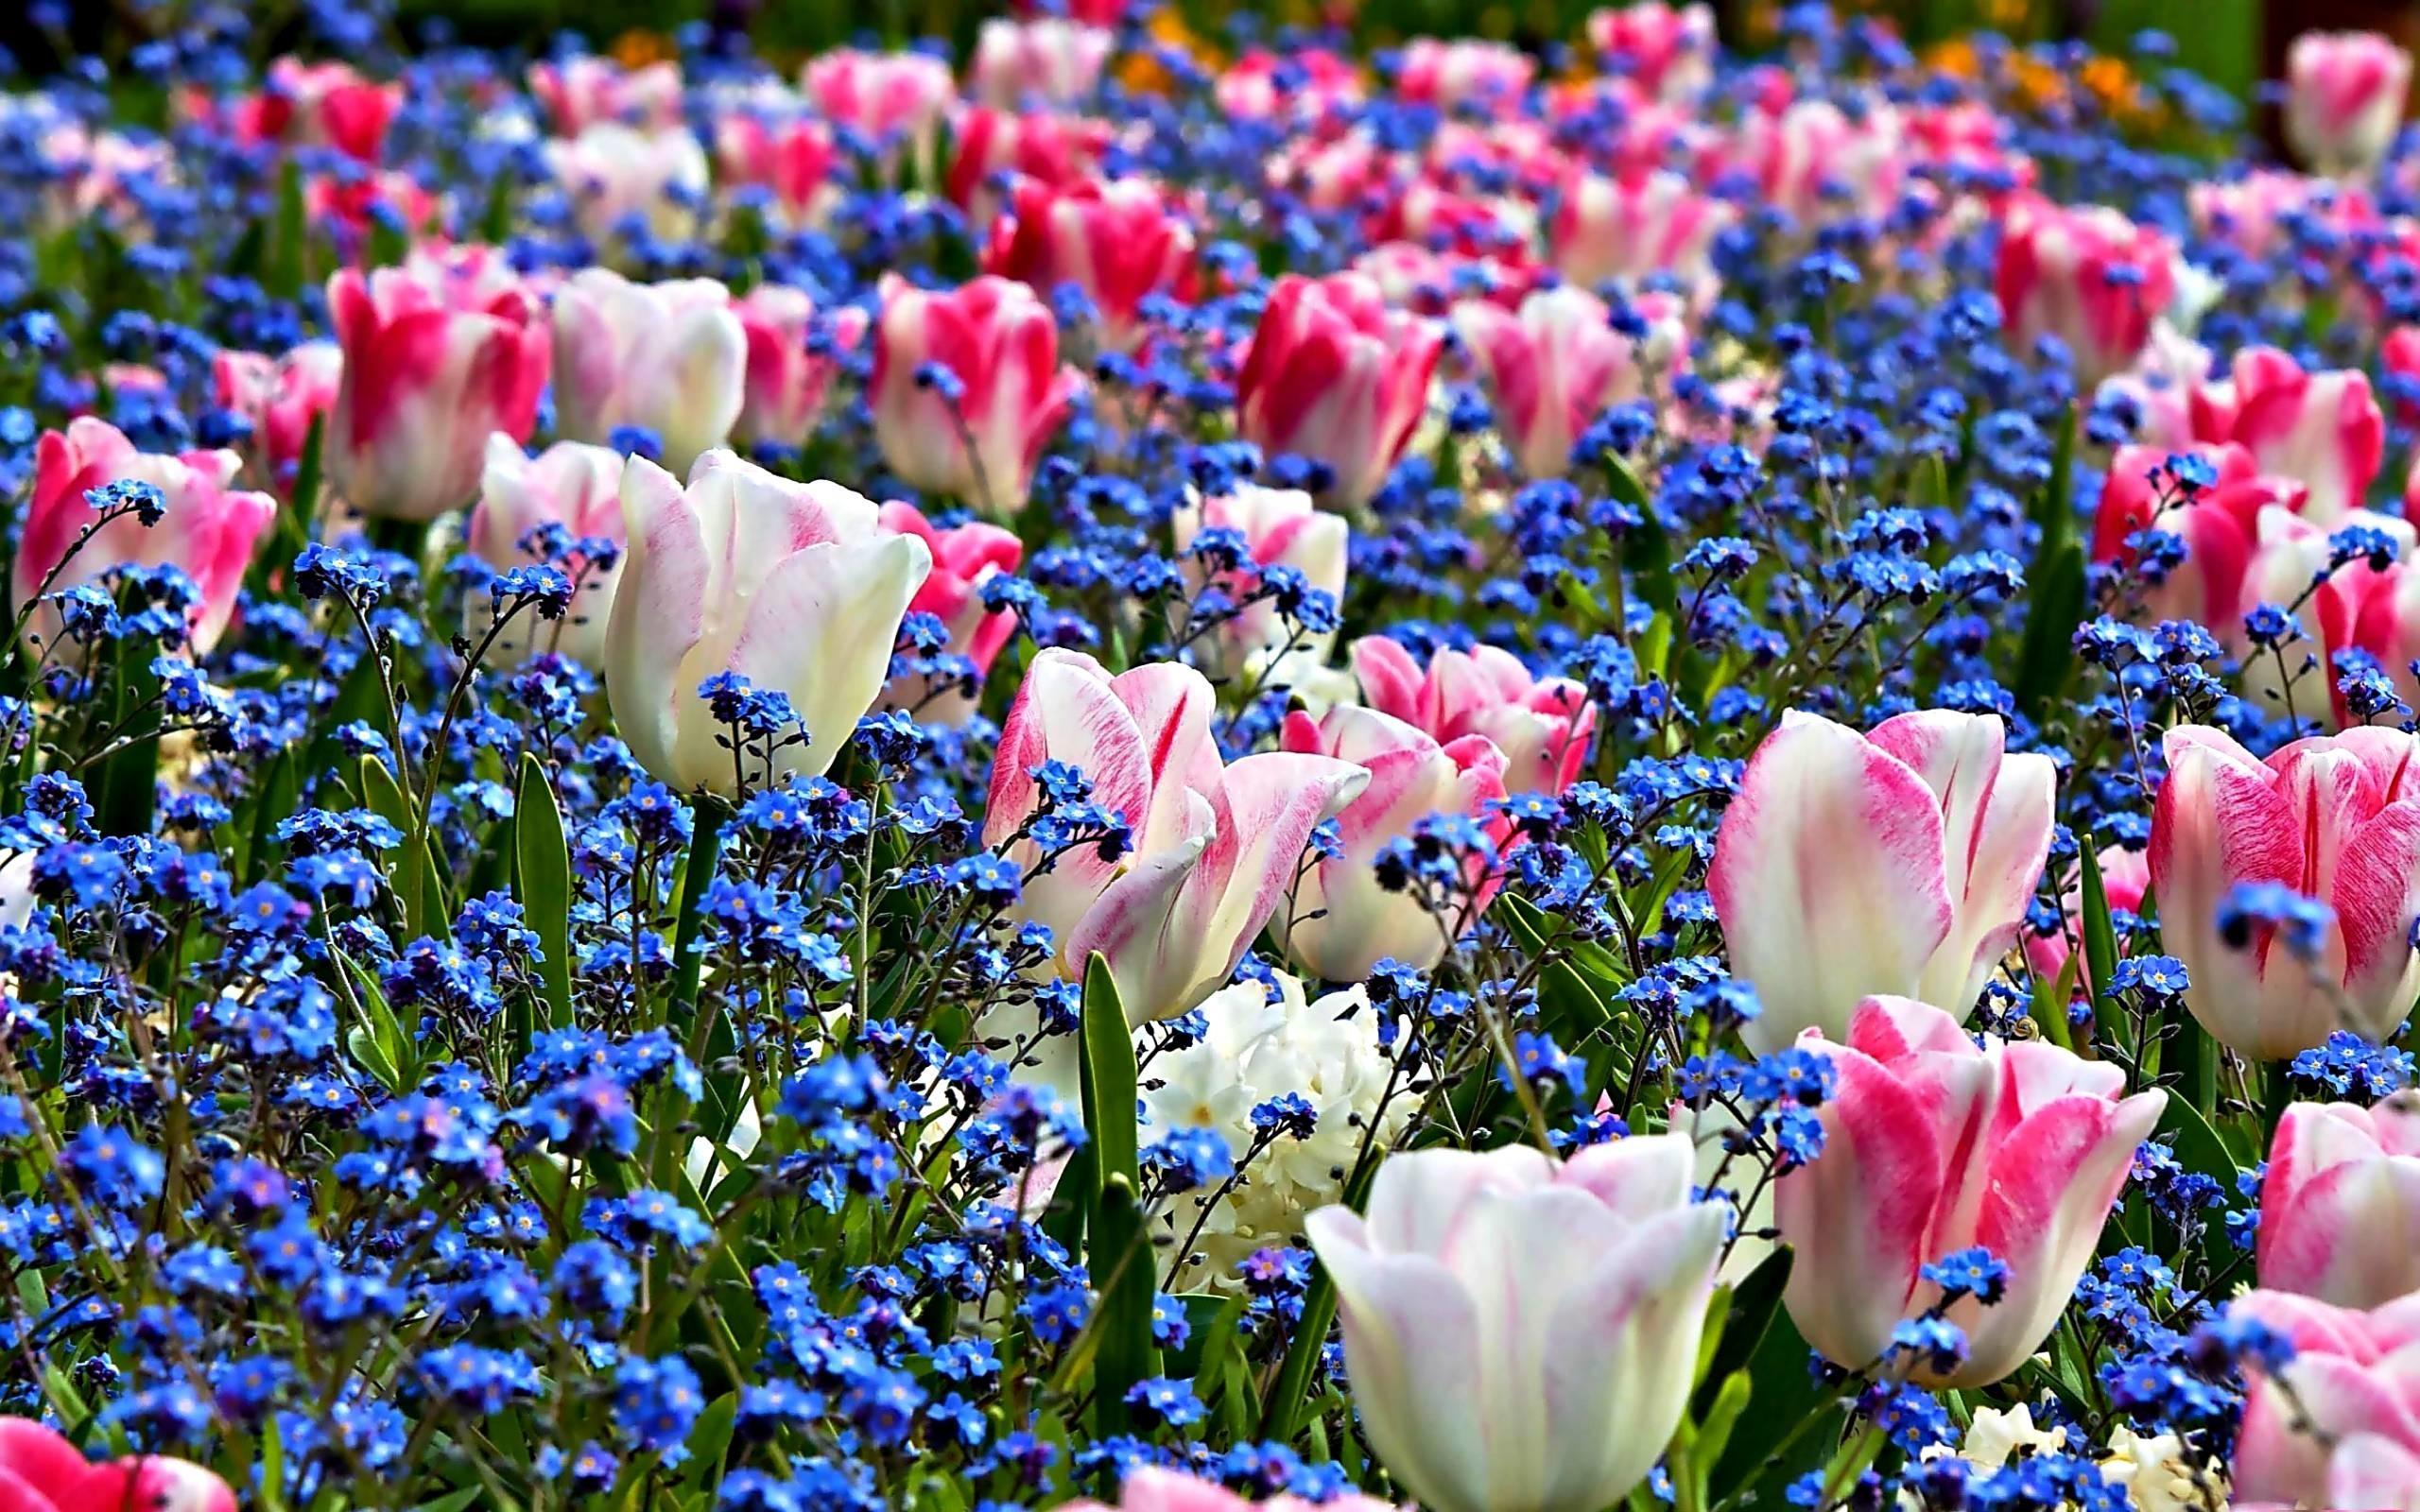 Spring Flowers Images Desktop Wallpaper : TimeDoll